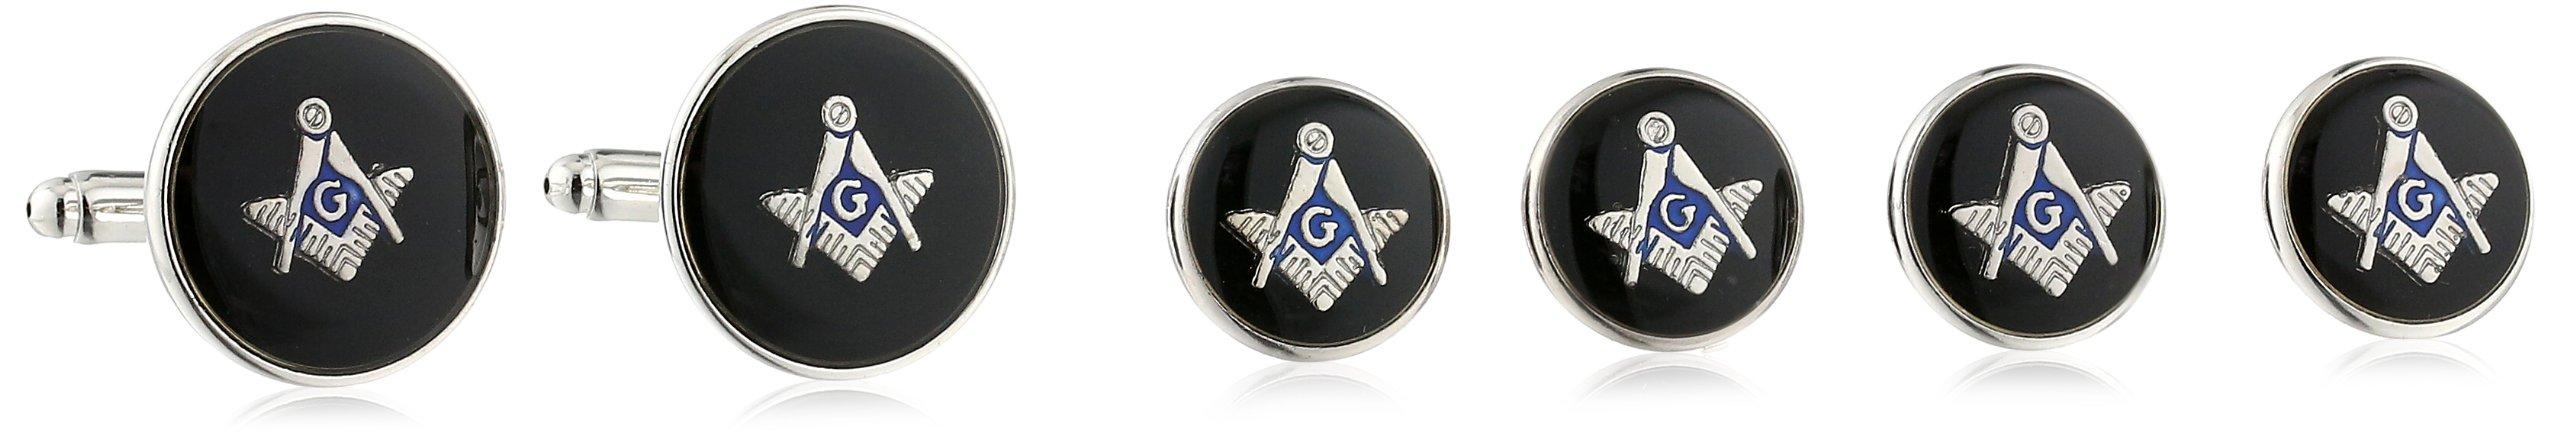 Status Men's Stud Set Masonic Round with Black Enamel With Masonic Compass, Silver, One Size